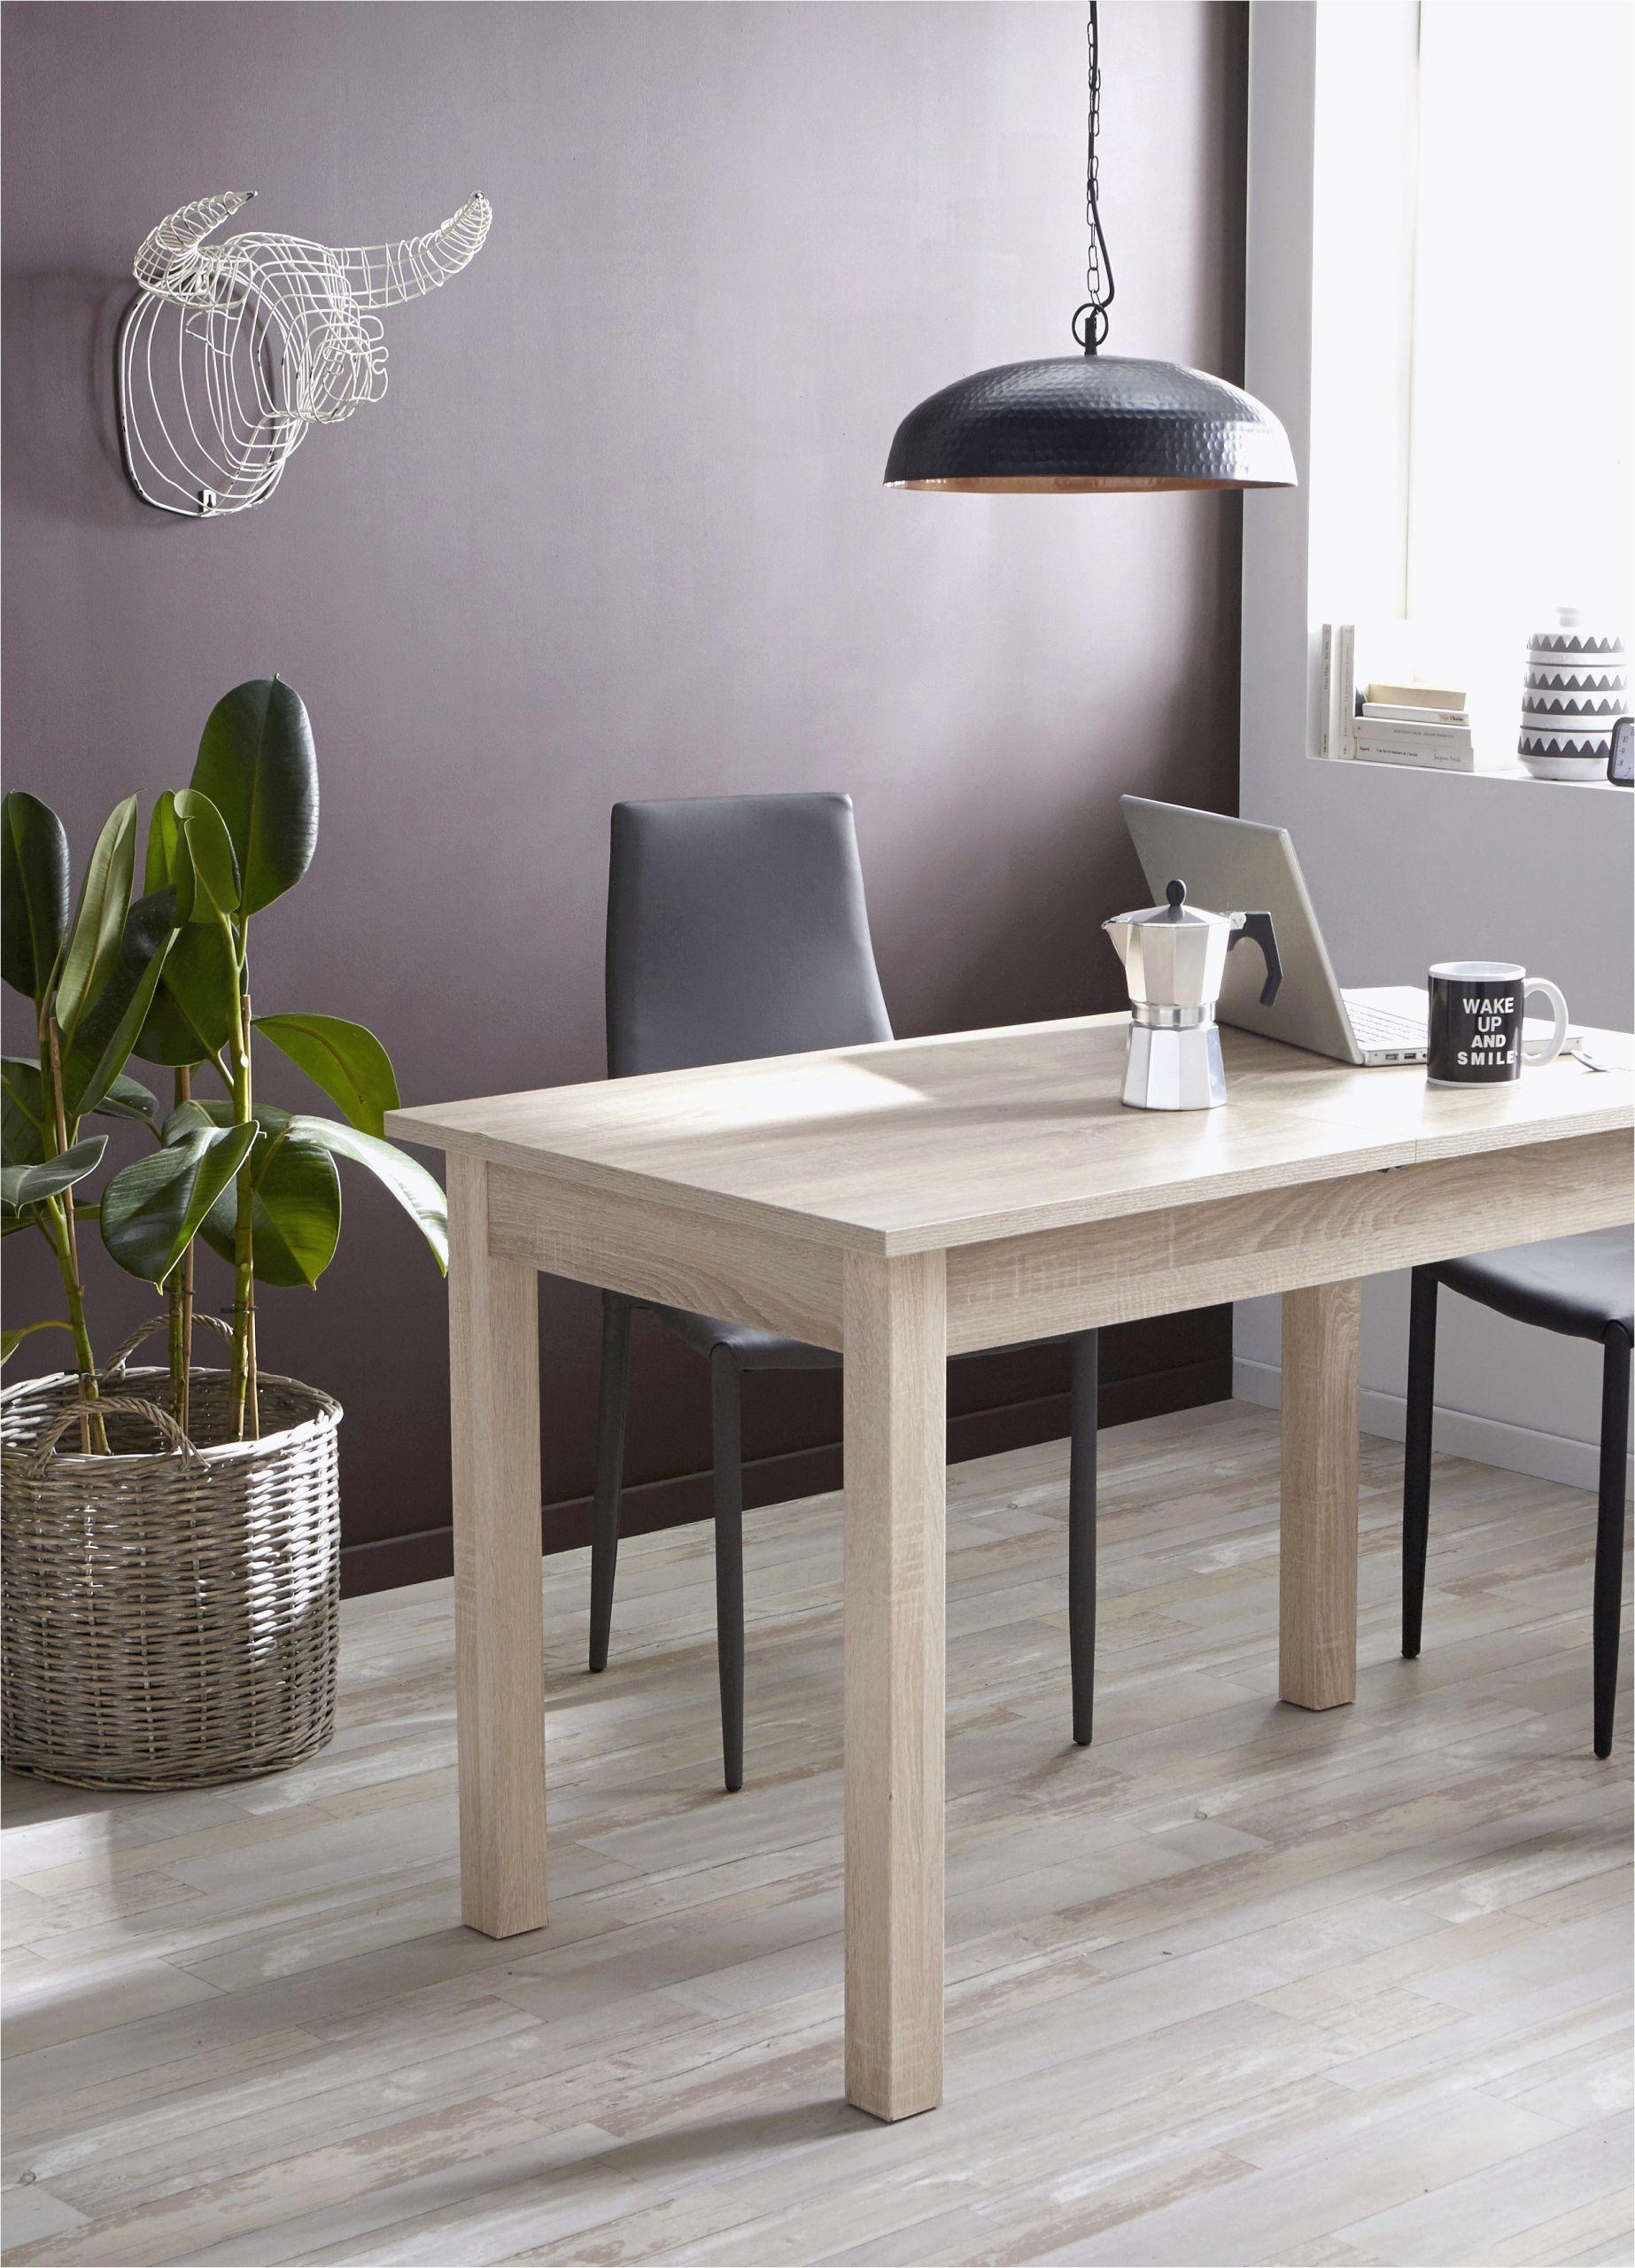 bureau leclerc meuble s leclerc promo luxe abri jardin leclerc luxury abri de jardin of bureau leclerc meuble